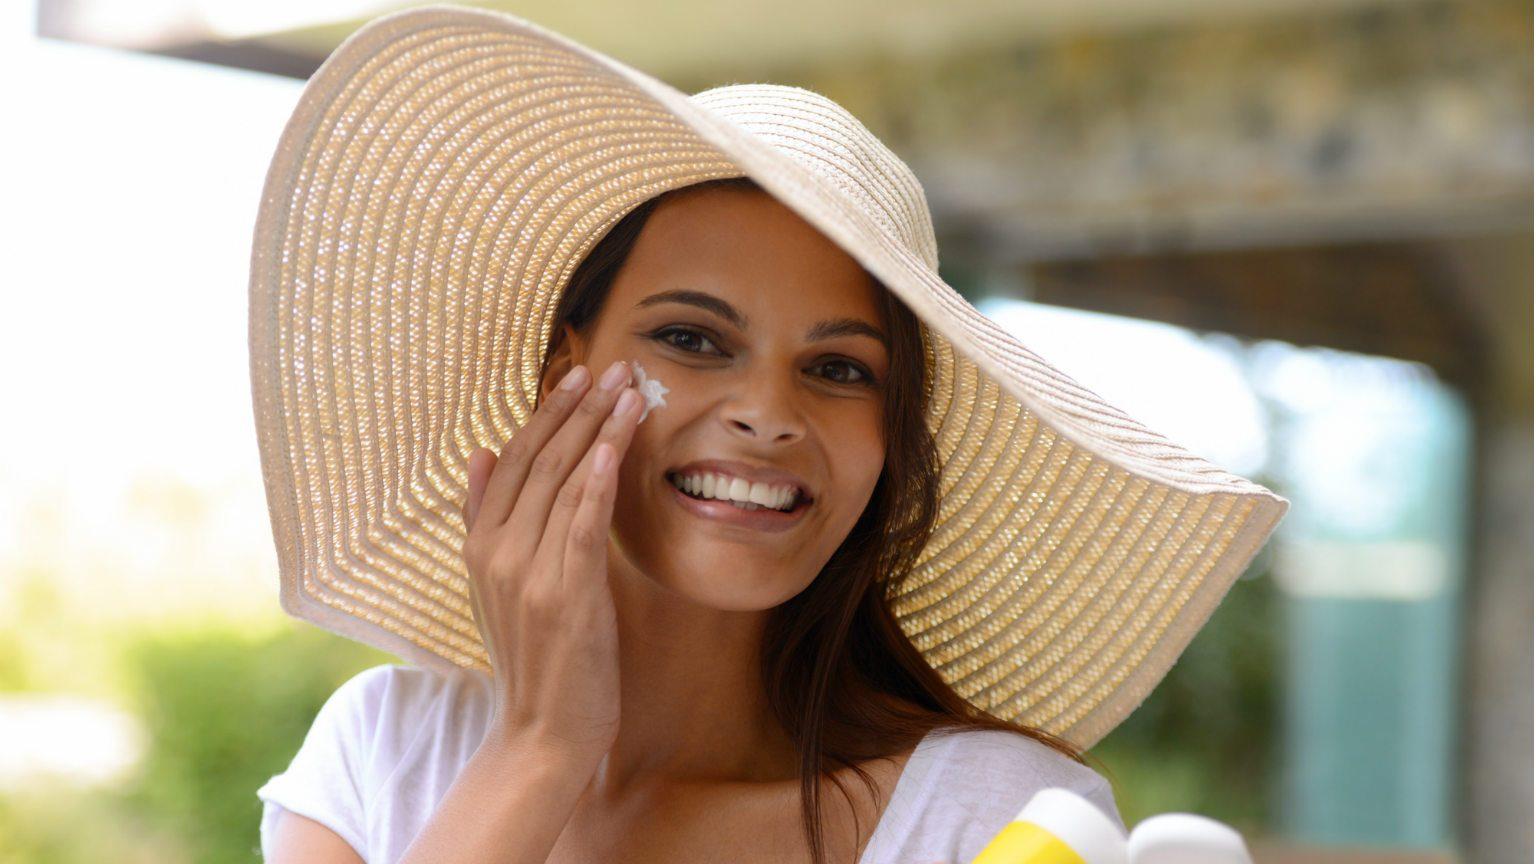 Young Woman Applying Sunscreen